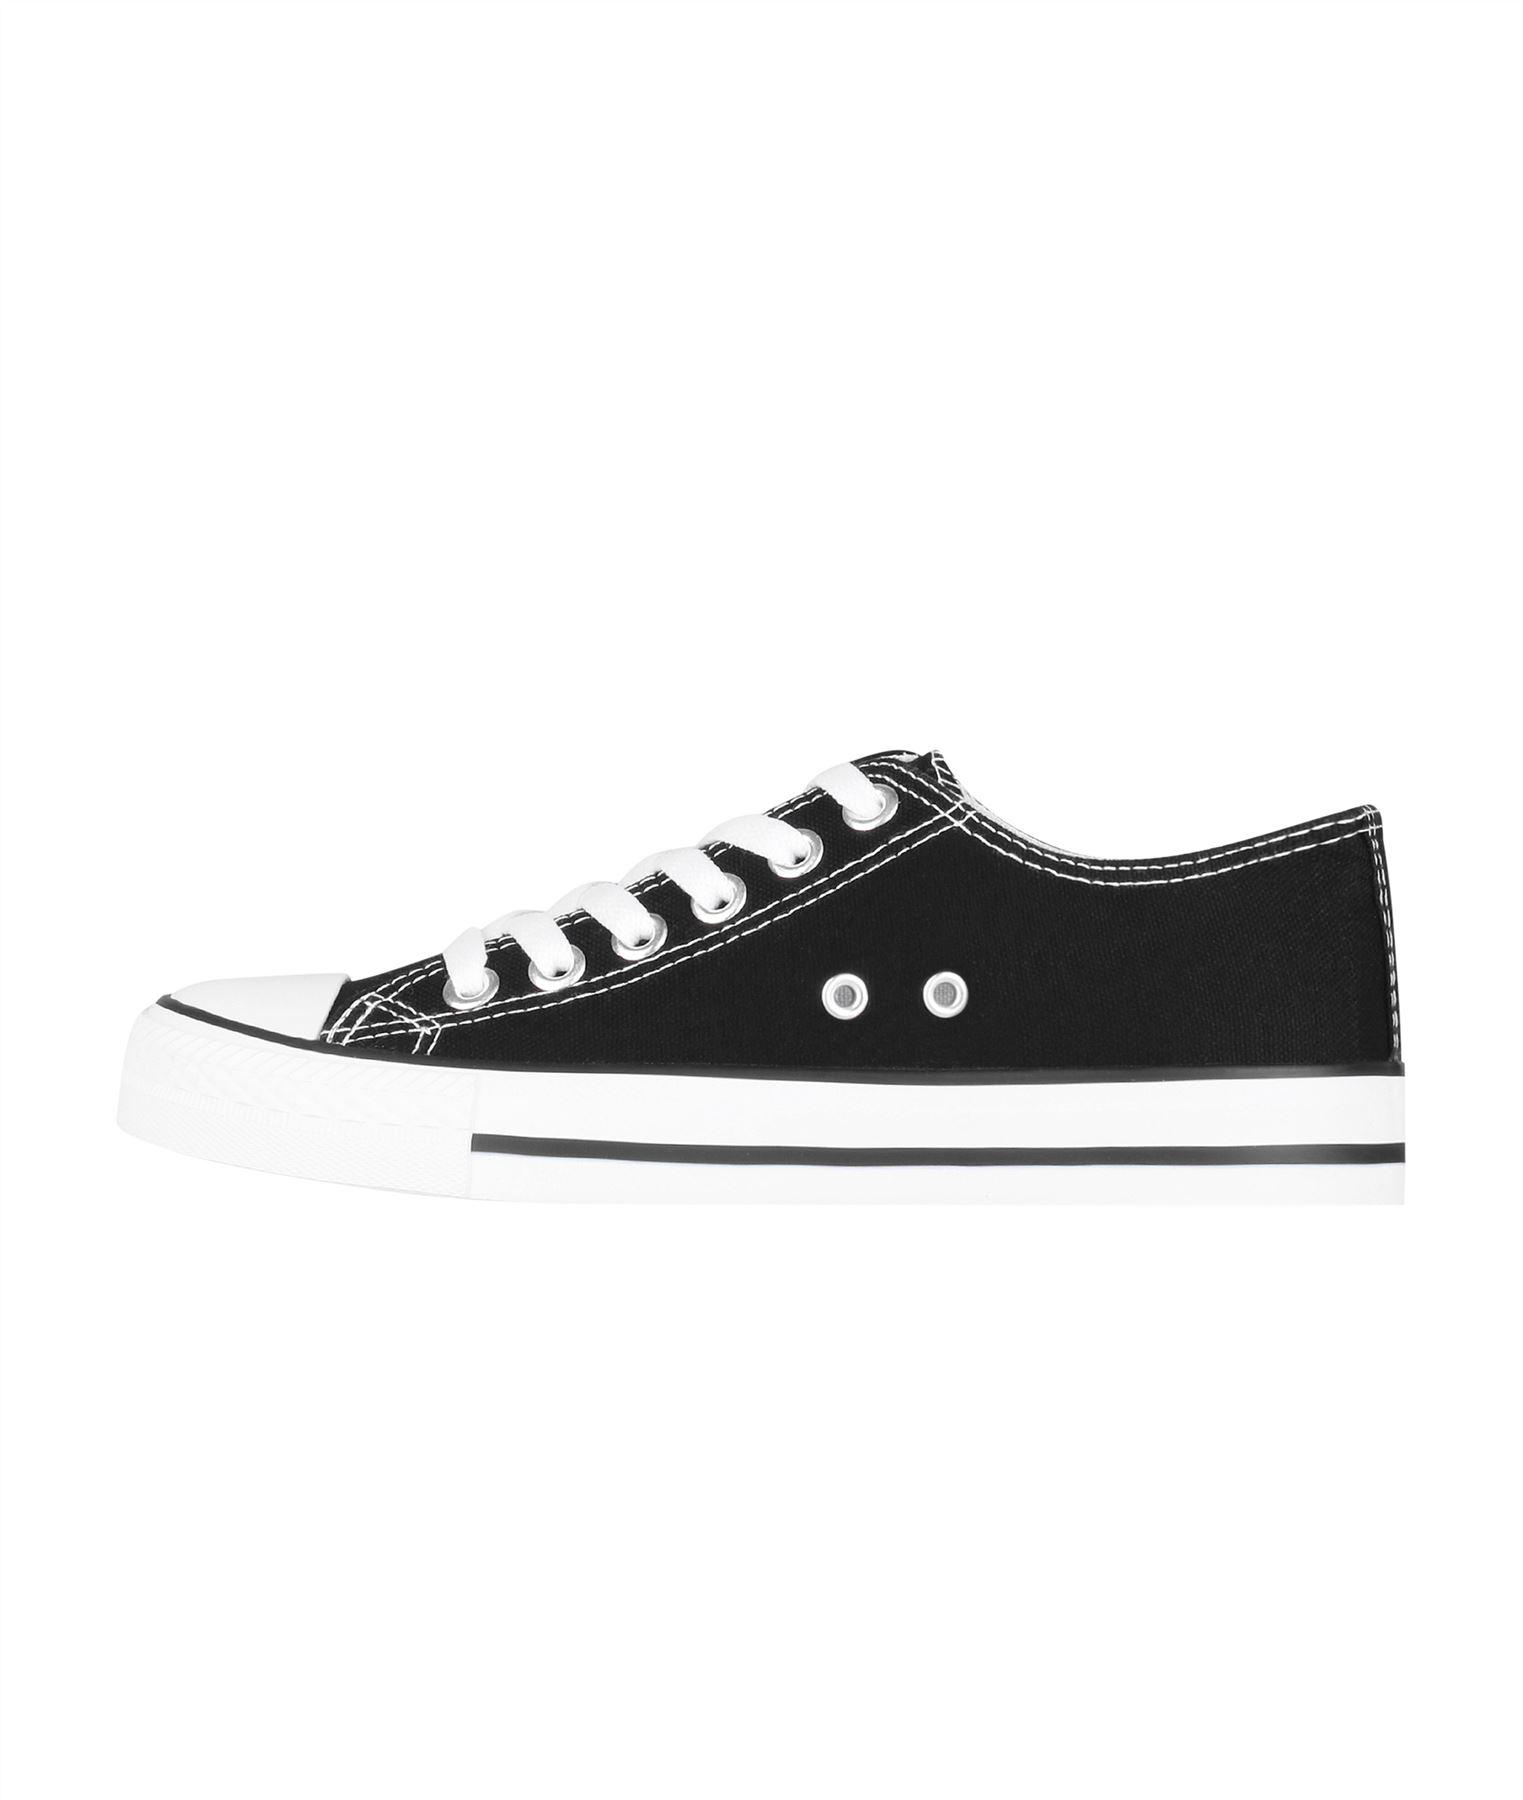 Zapatillas-Mujer-Casuales-Deportiva-Barata-Lona-Moda-Originales-Outlet-Tela-Moda miniatura 35